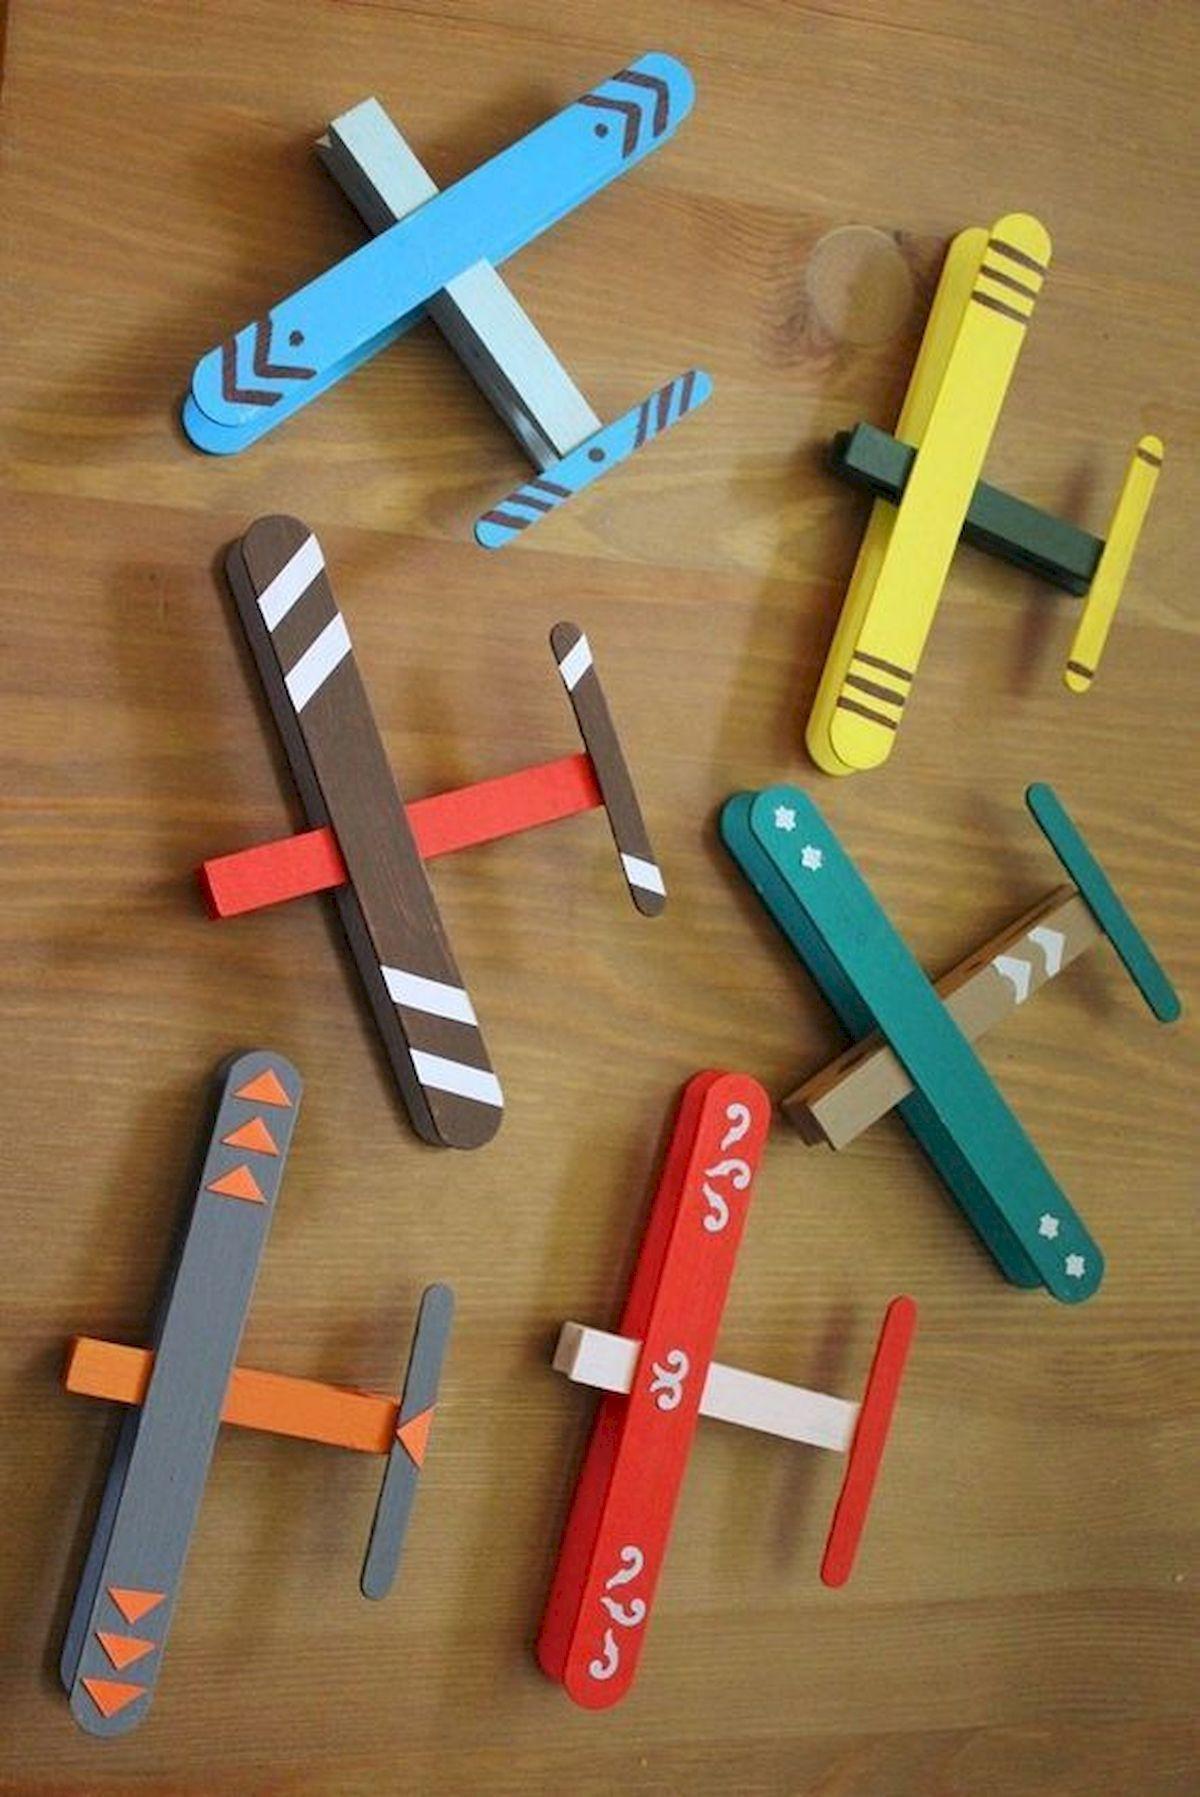 Craft Stick Crafts 40 Easy Diy Spring Crafts Ideas For Kids